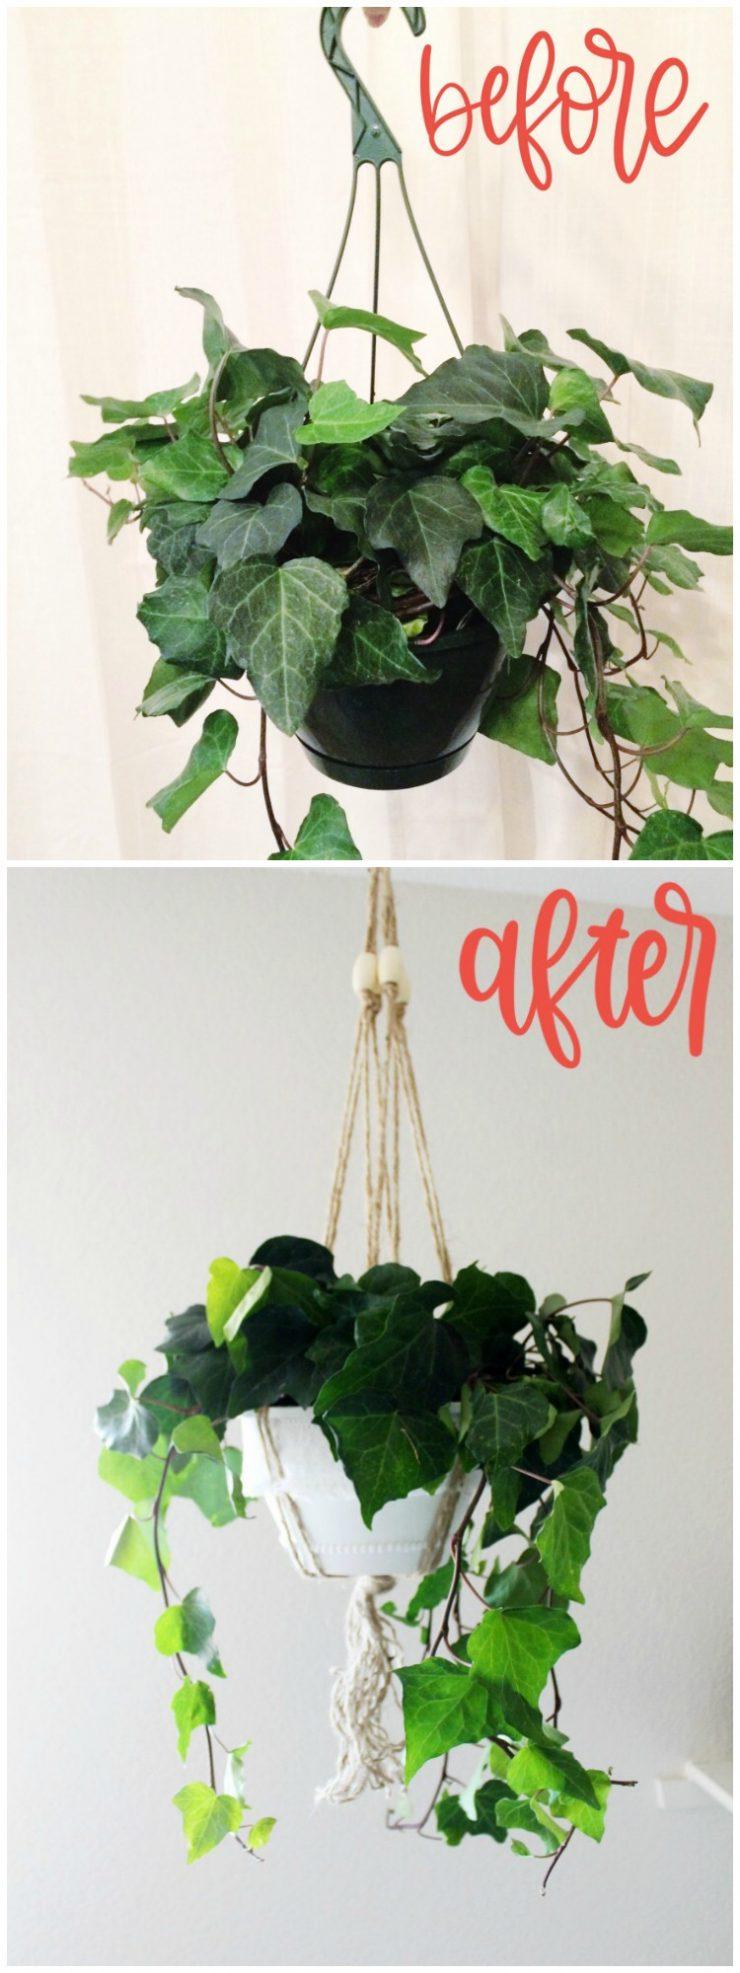 Plastic Hanging Planter DIY Boho Makeover: the Child at Heart blog